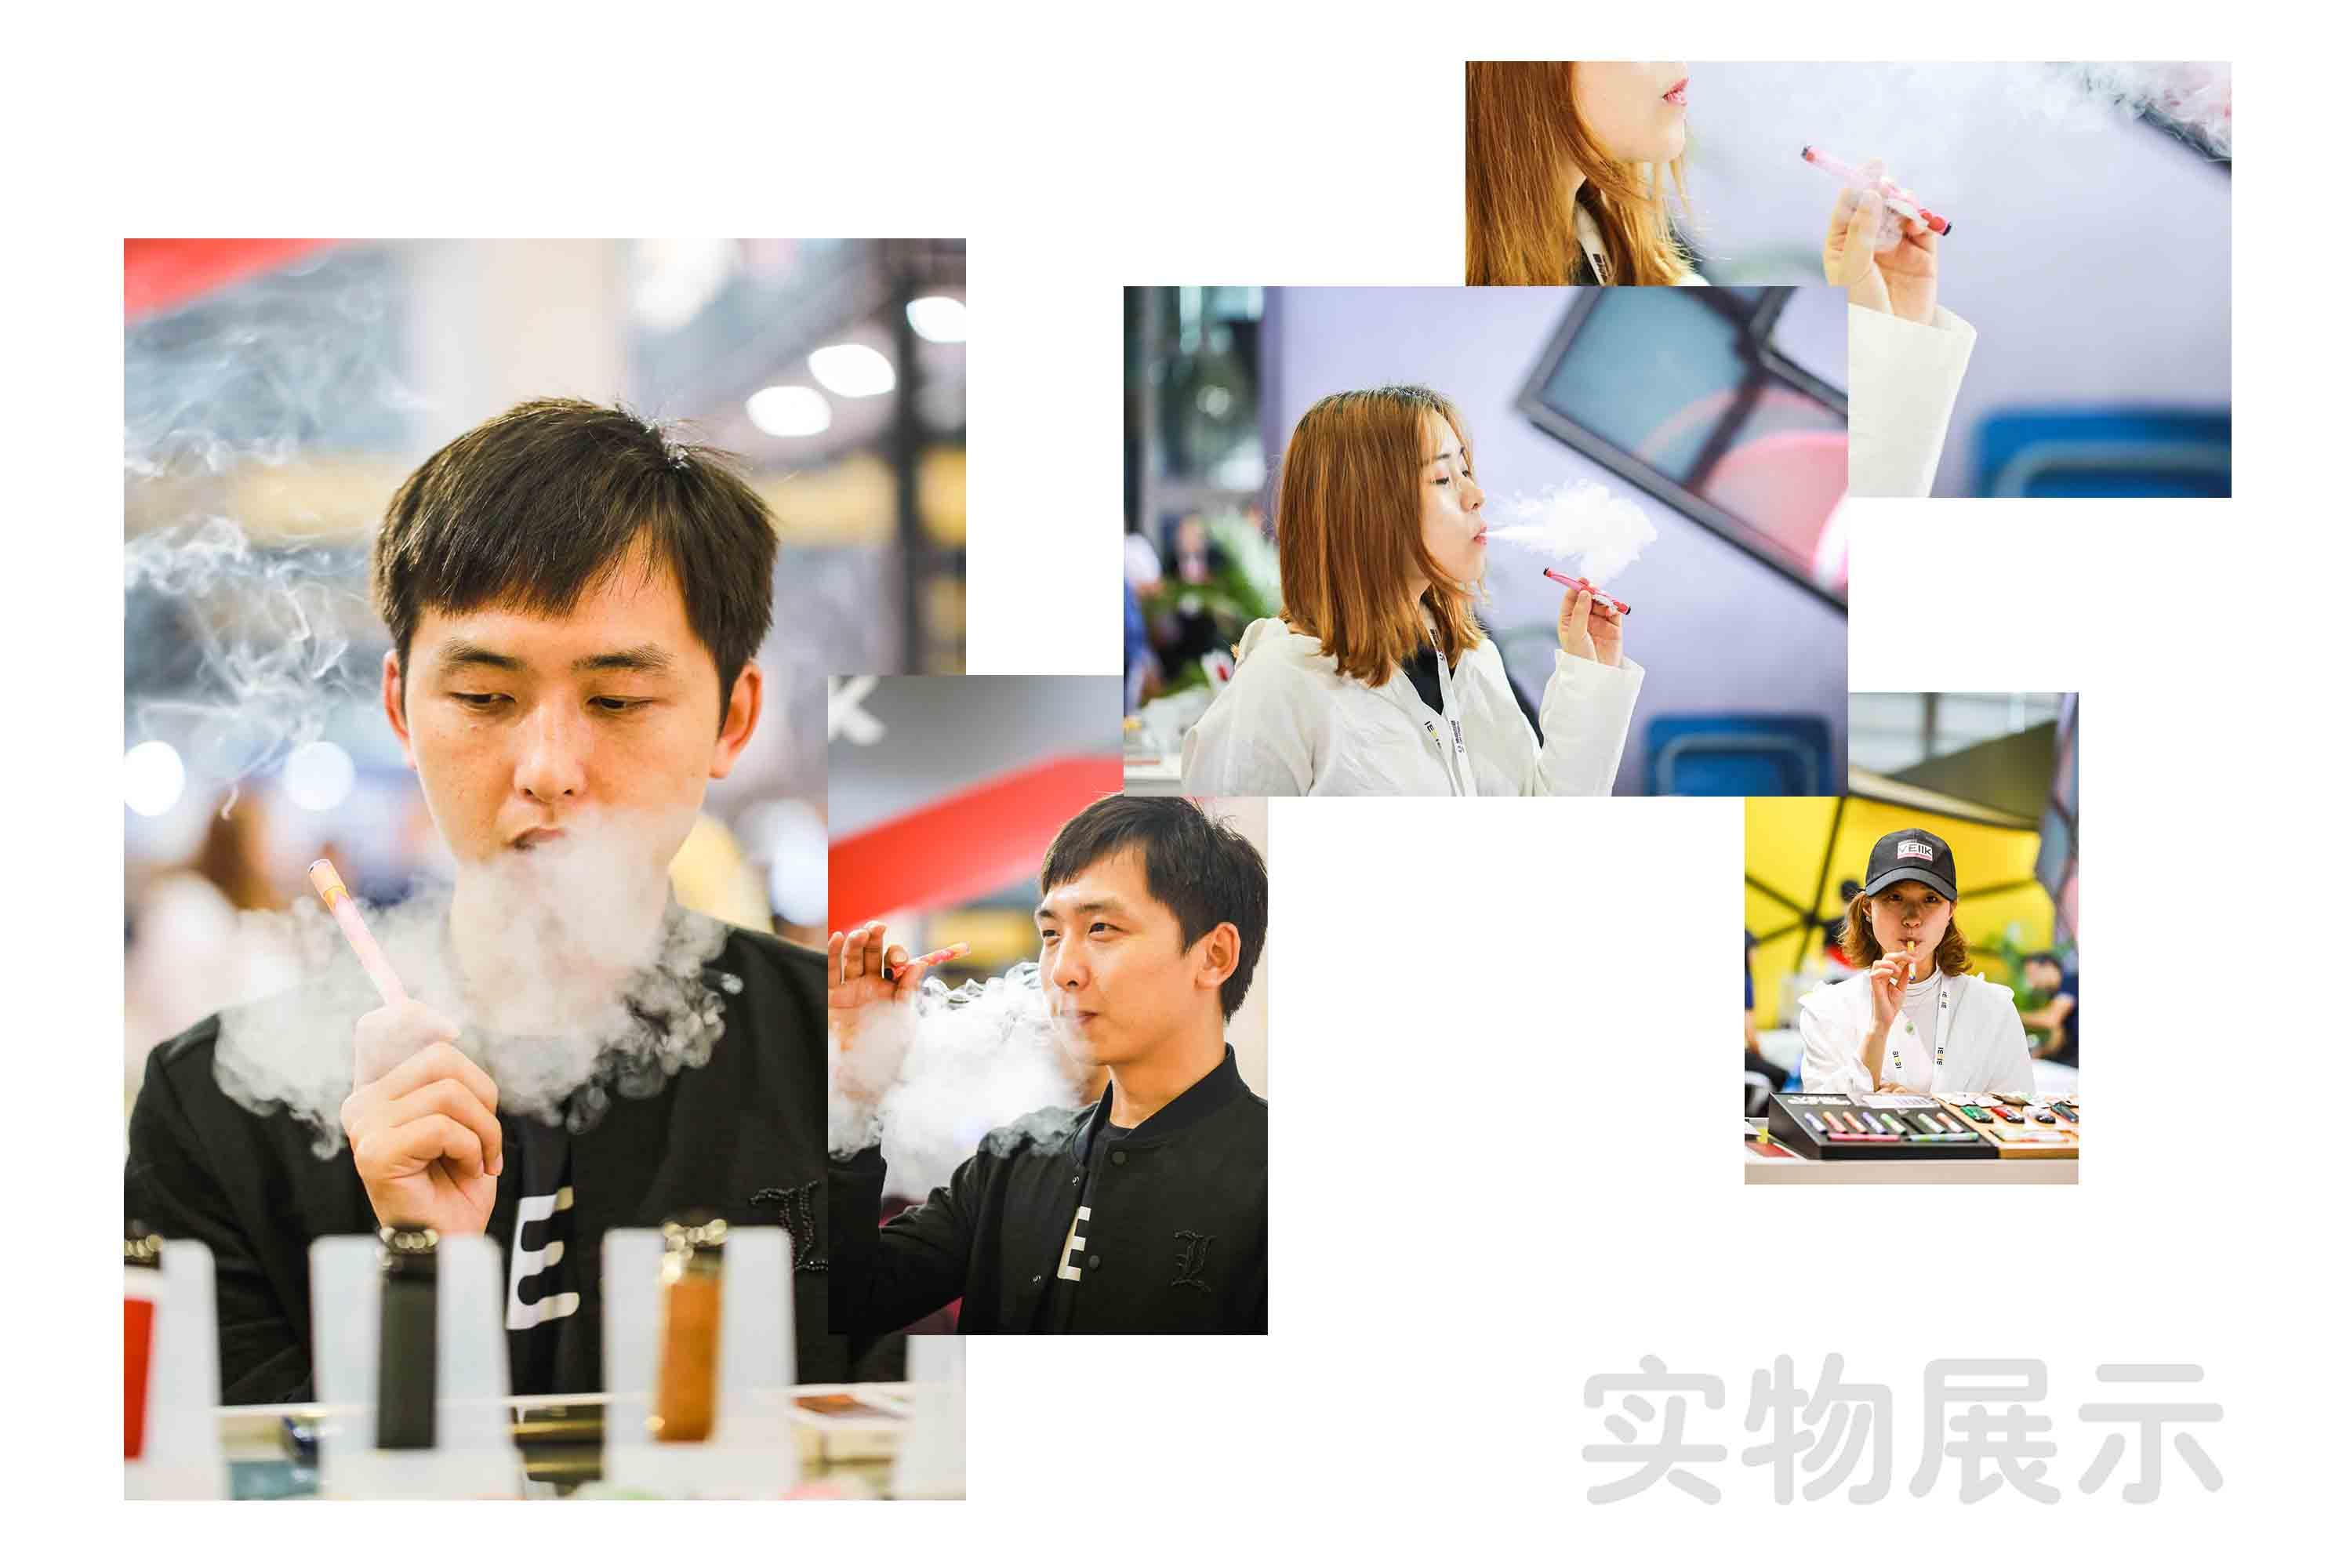 micko小烟中文版详情-4-实拍